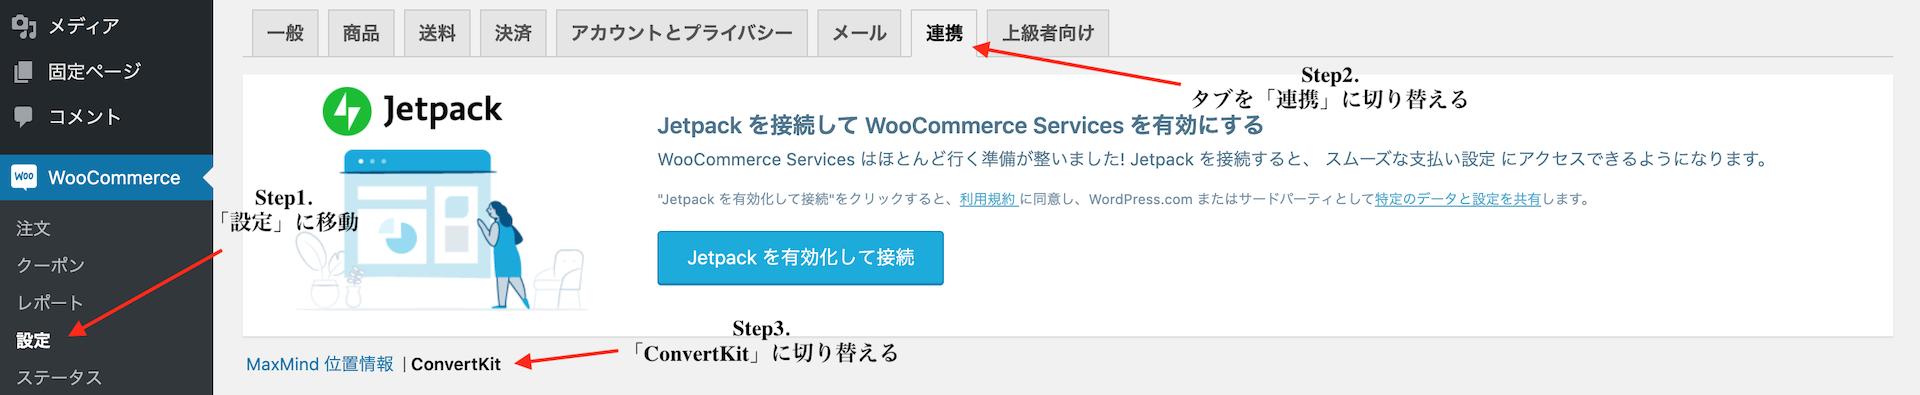 WooCommerceの「設定」でConvertKitと連携する